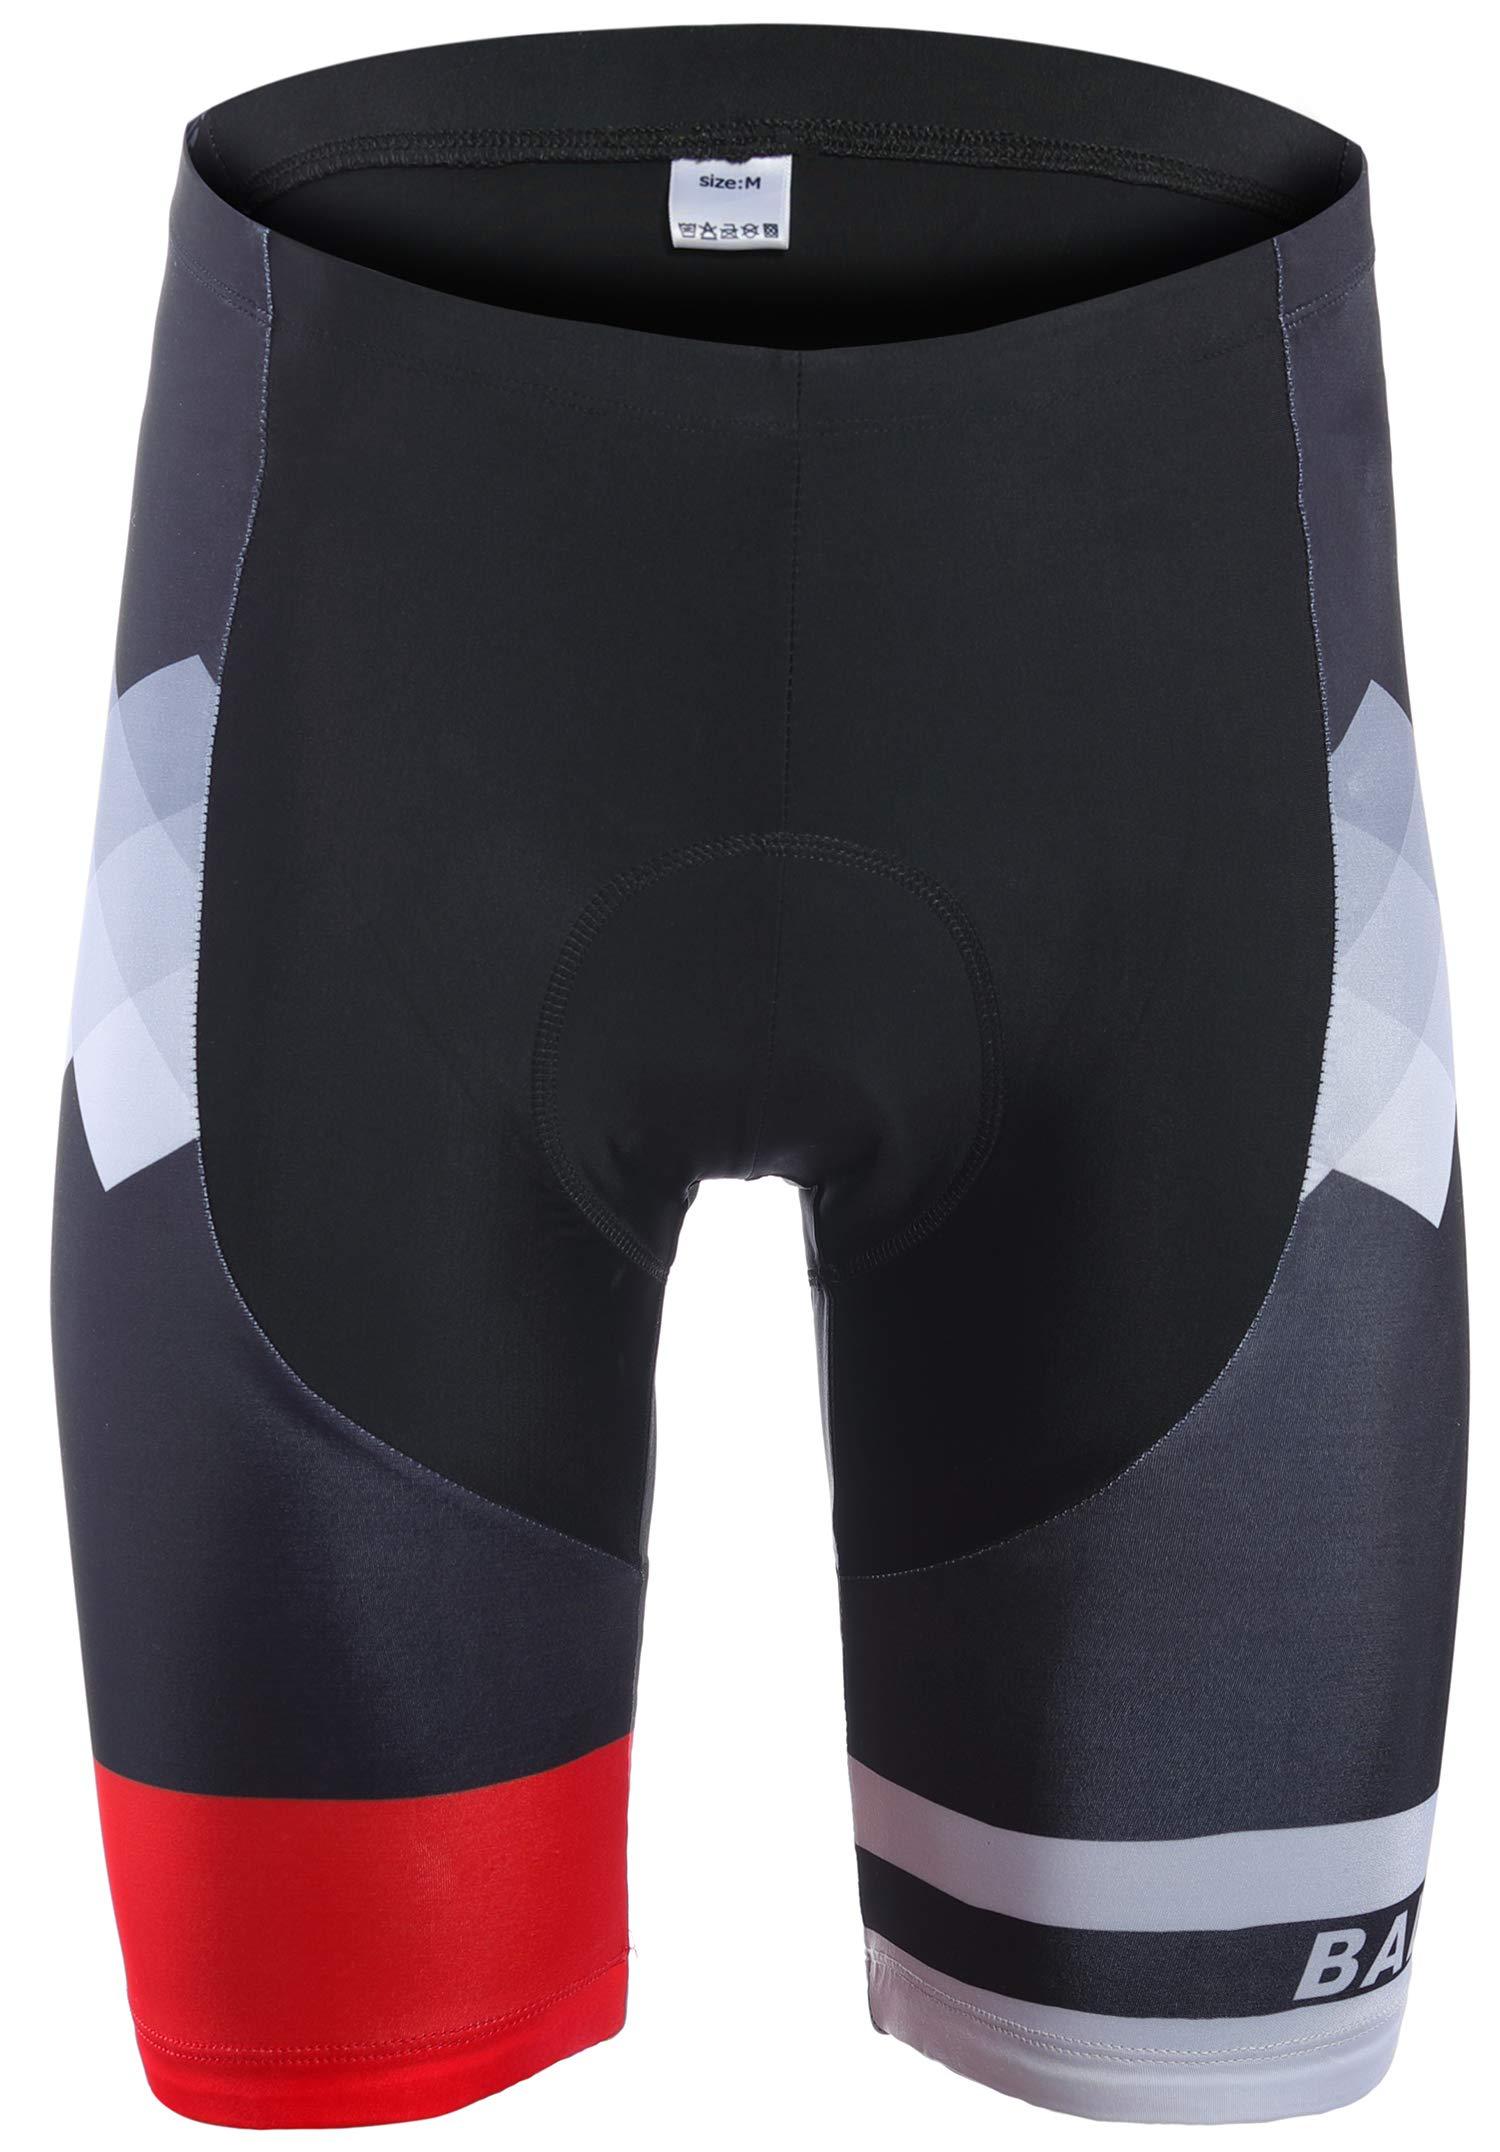 Balnna Padded Cycling Shorts Bicycle Bike Pants Half Pants 4D Coolmax-Red-XL by Balnna